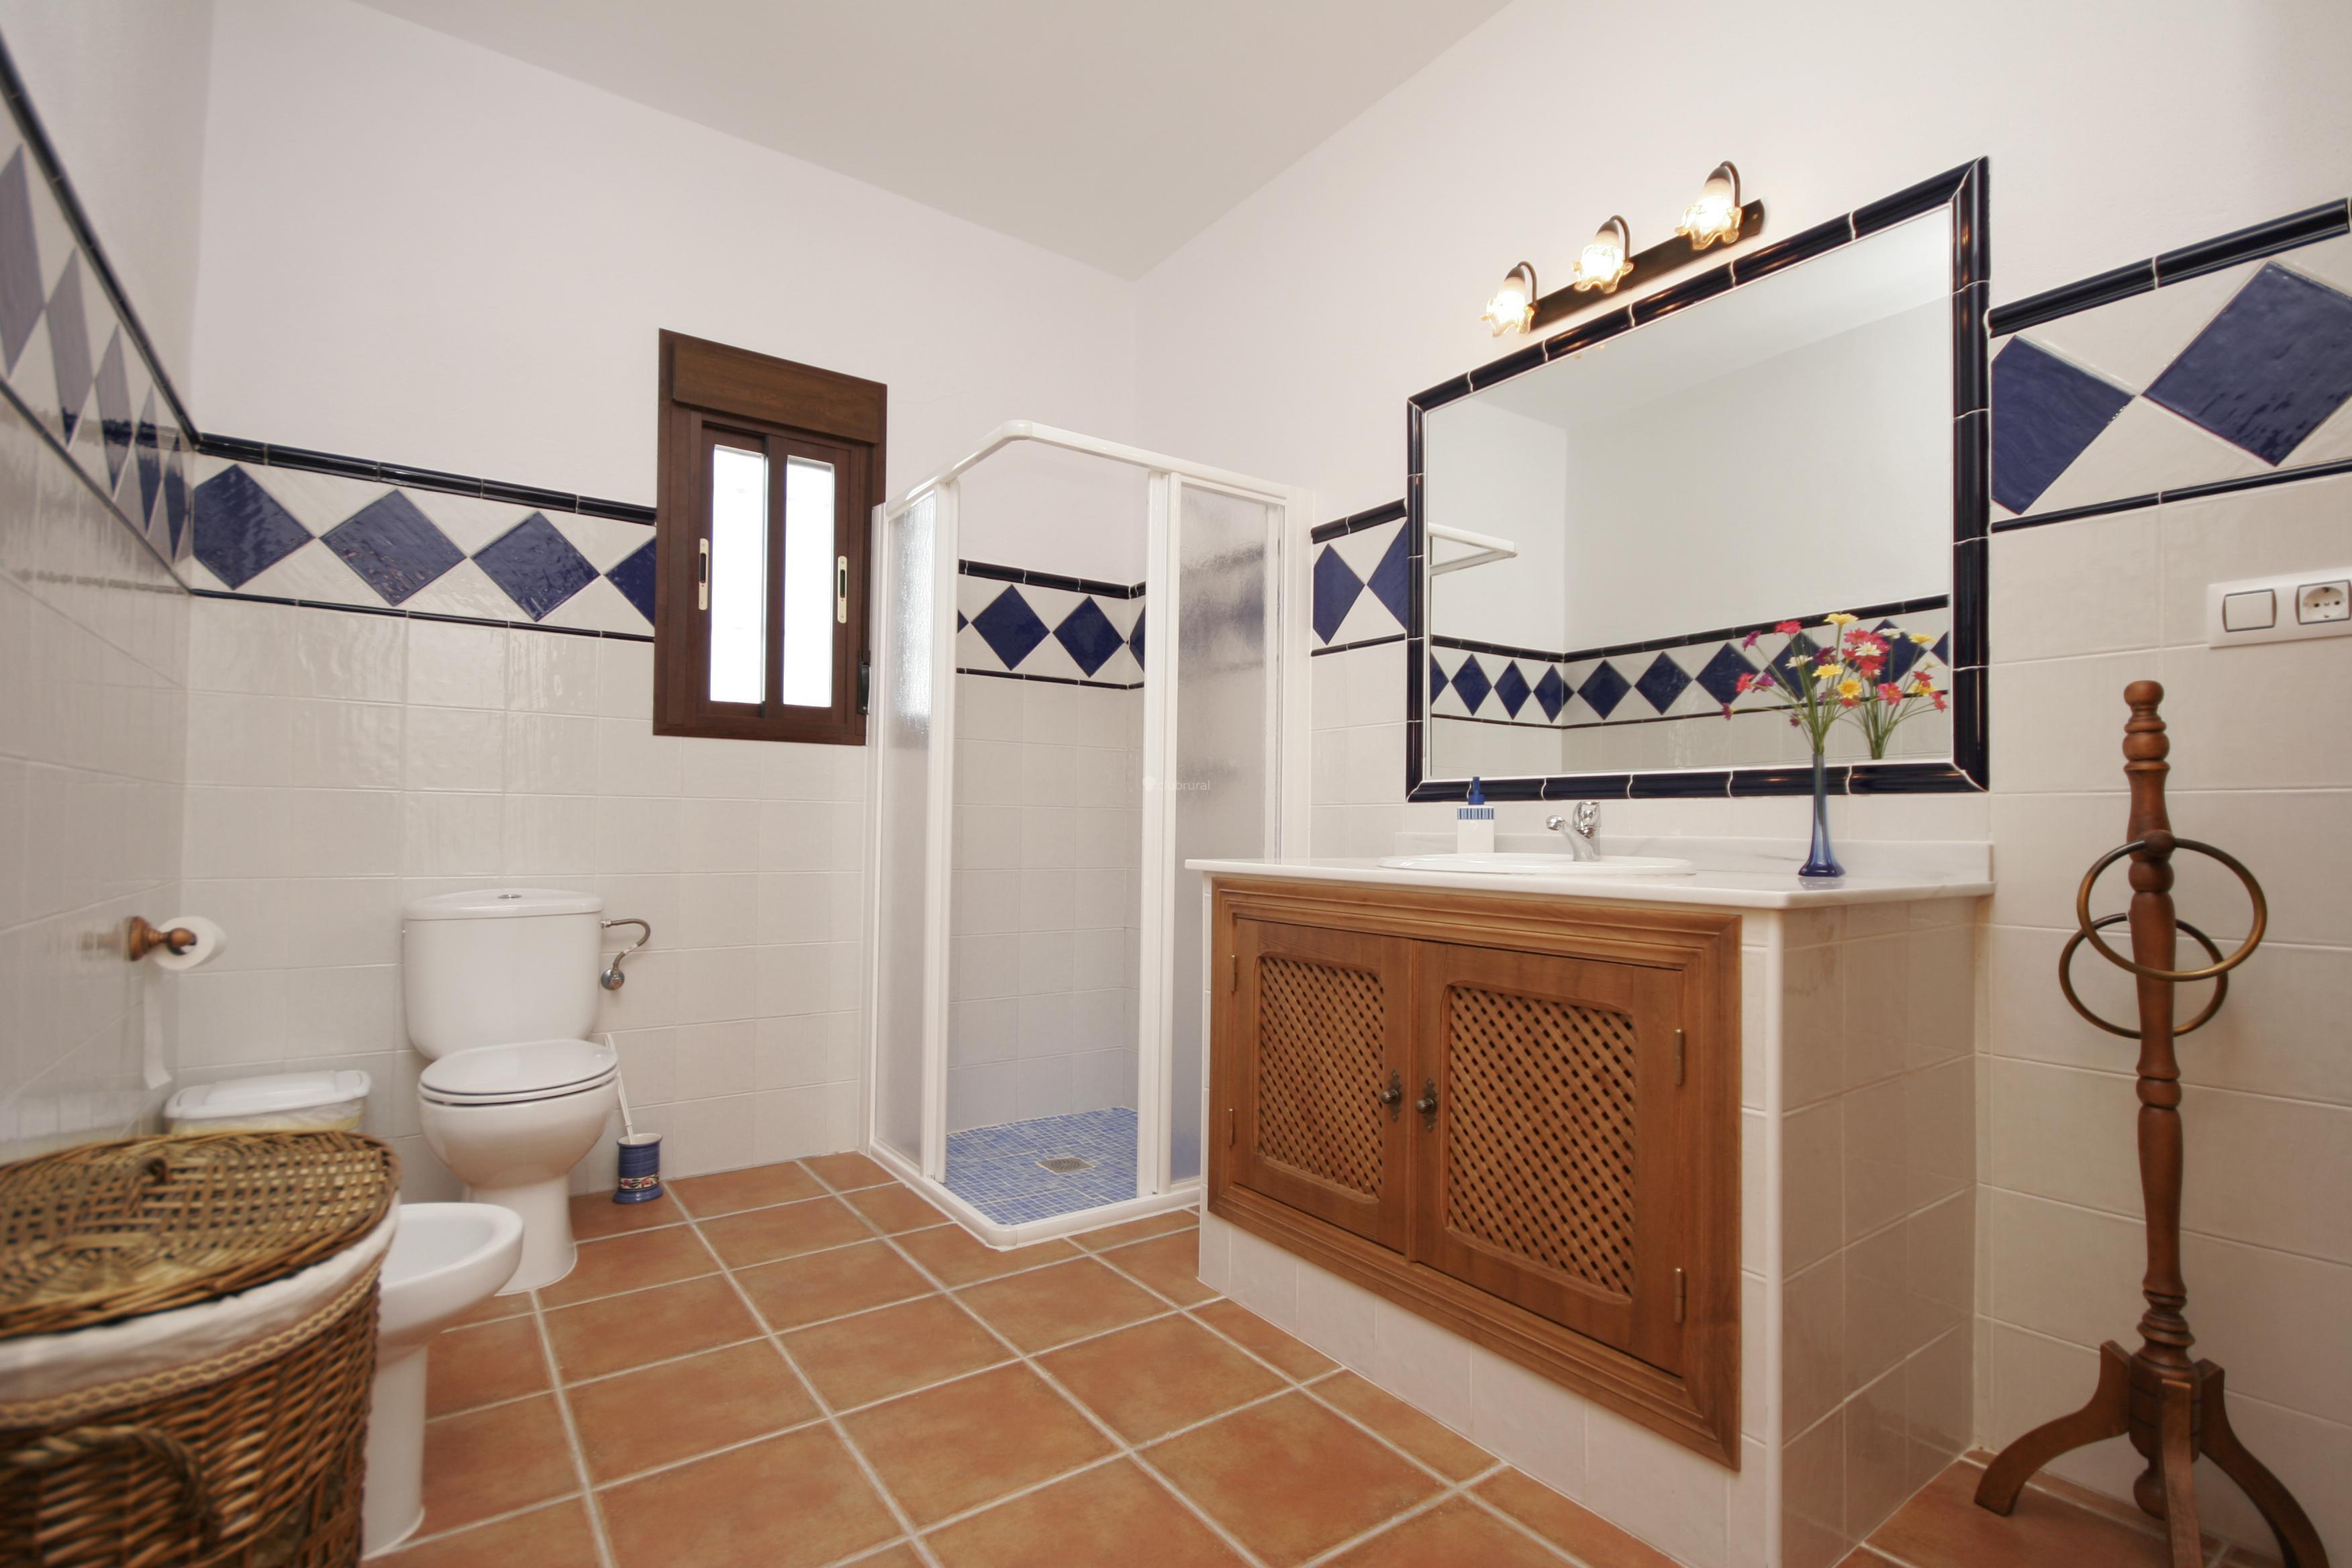 Fotos de casa rural manolin c rdoba posadas clubrural for Casa de azulejos cordoba